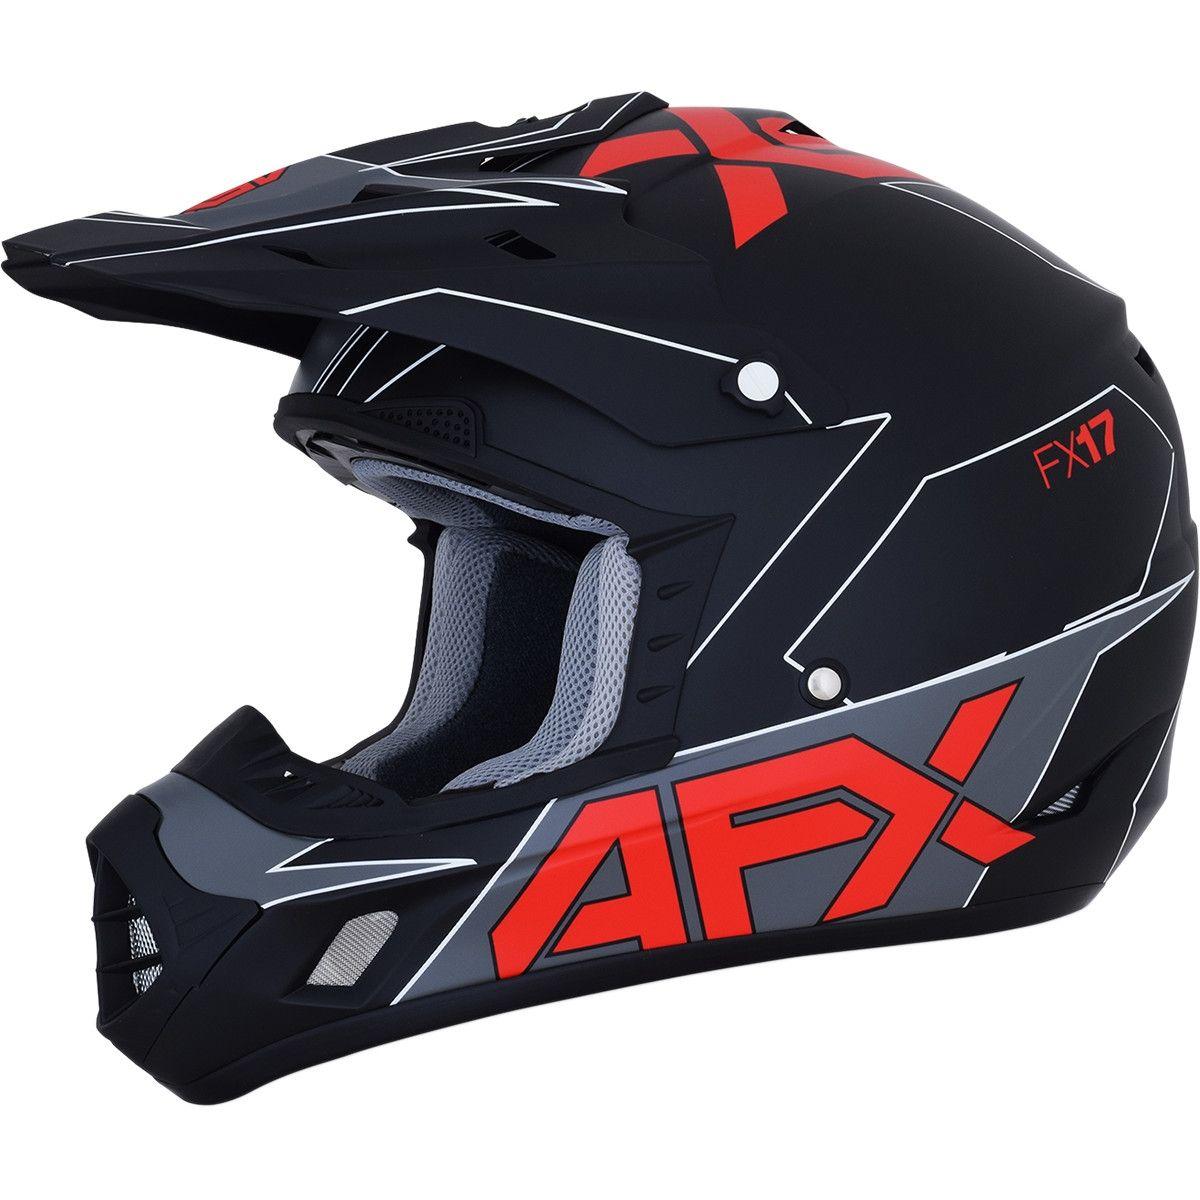 AFX Crosshelm FX-17 Matte Black/Red